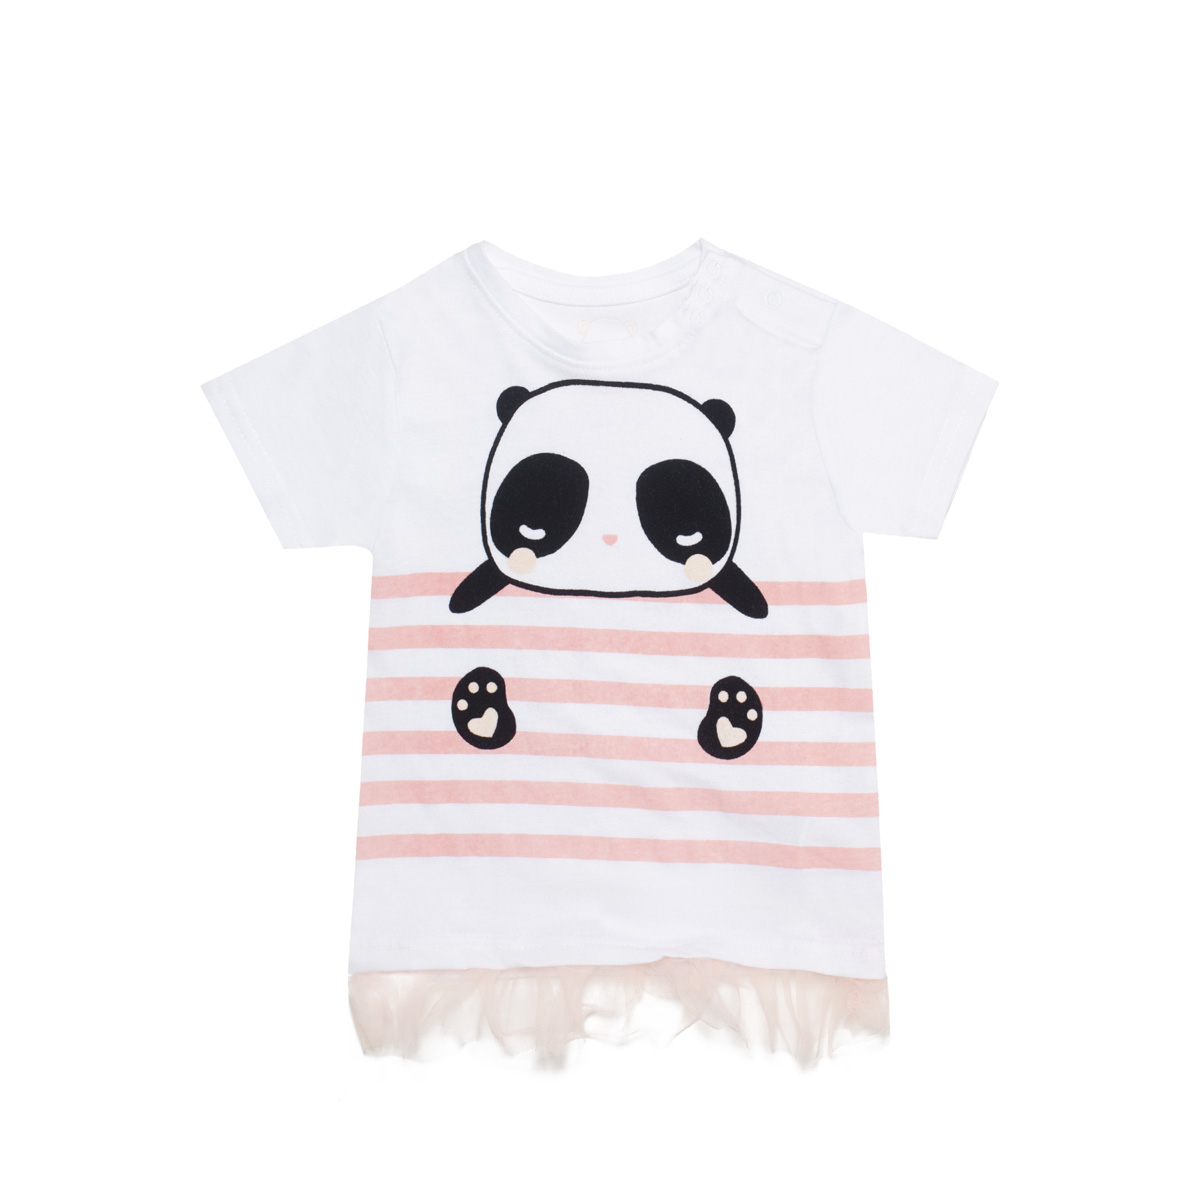 Baby majica, bela